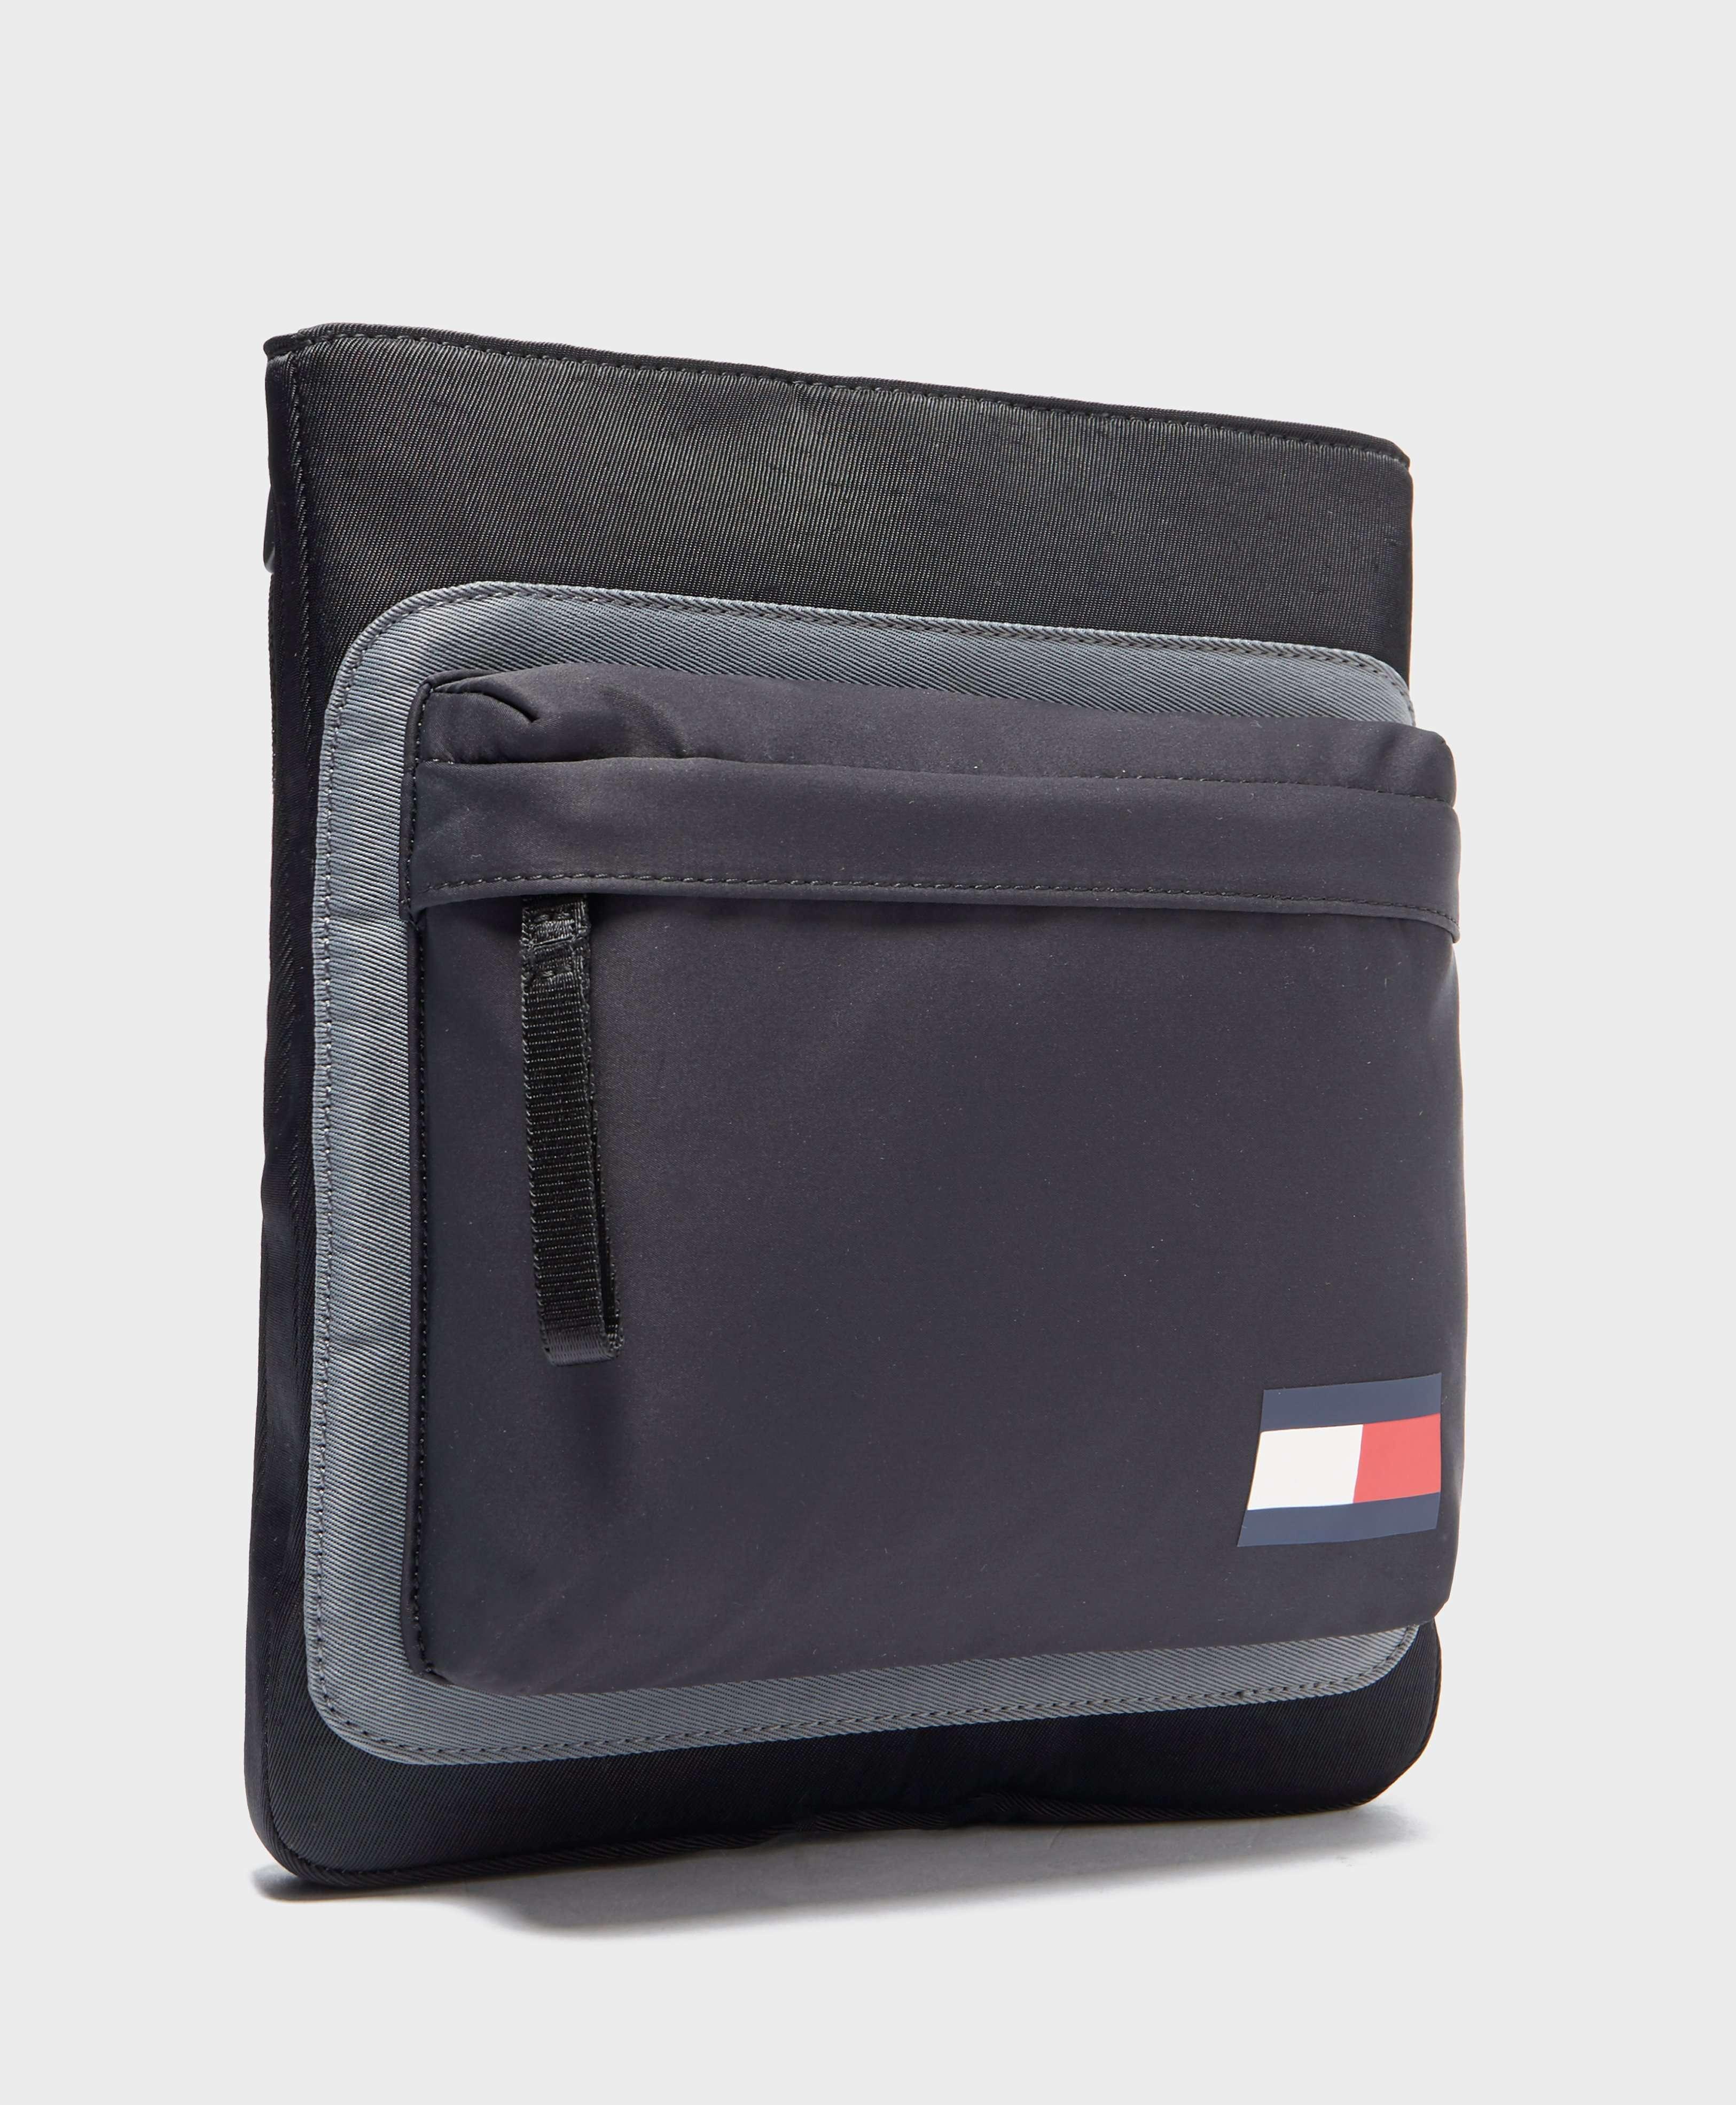 Tommy Hilfiger Cross Body Bag